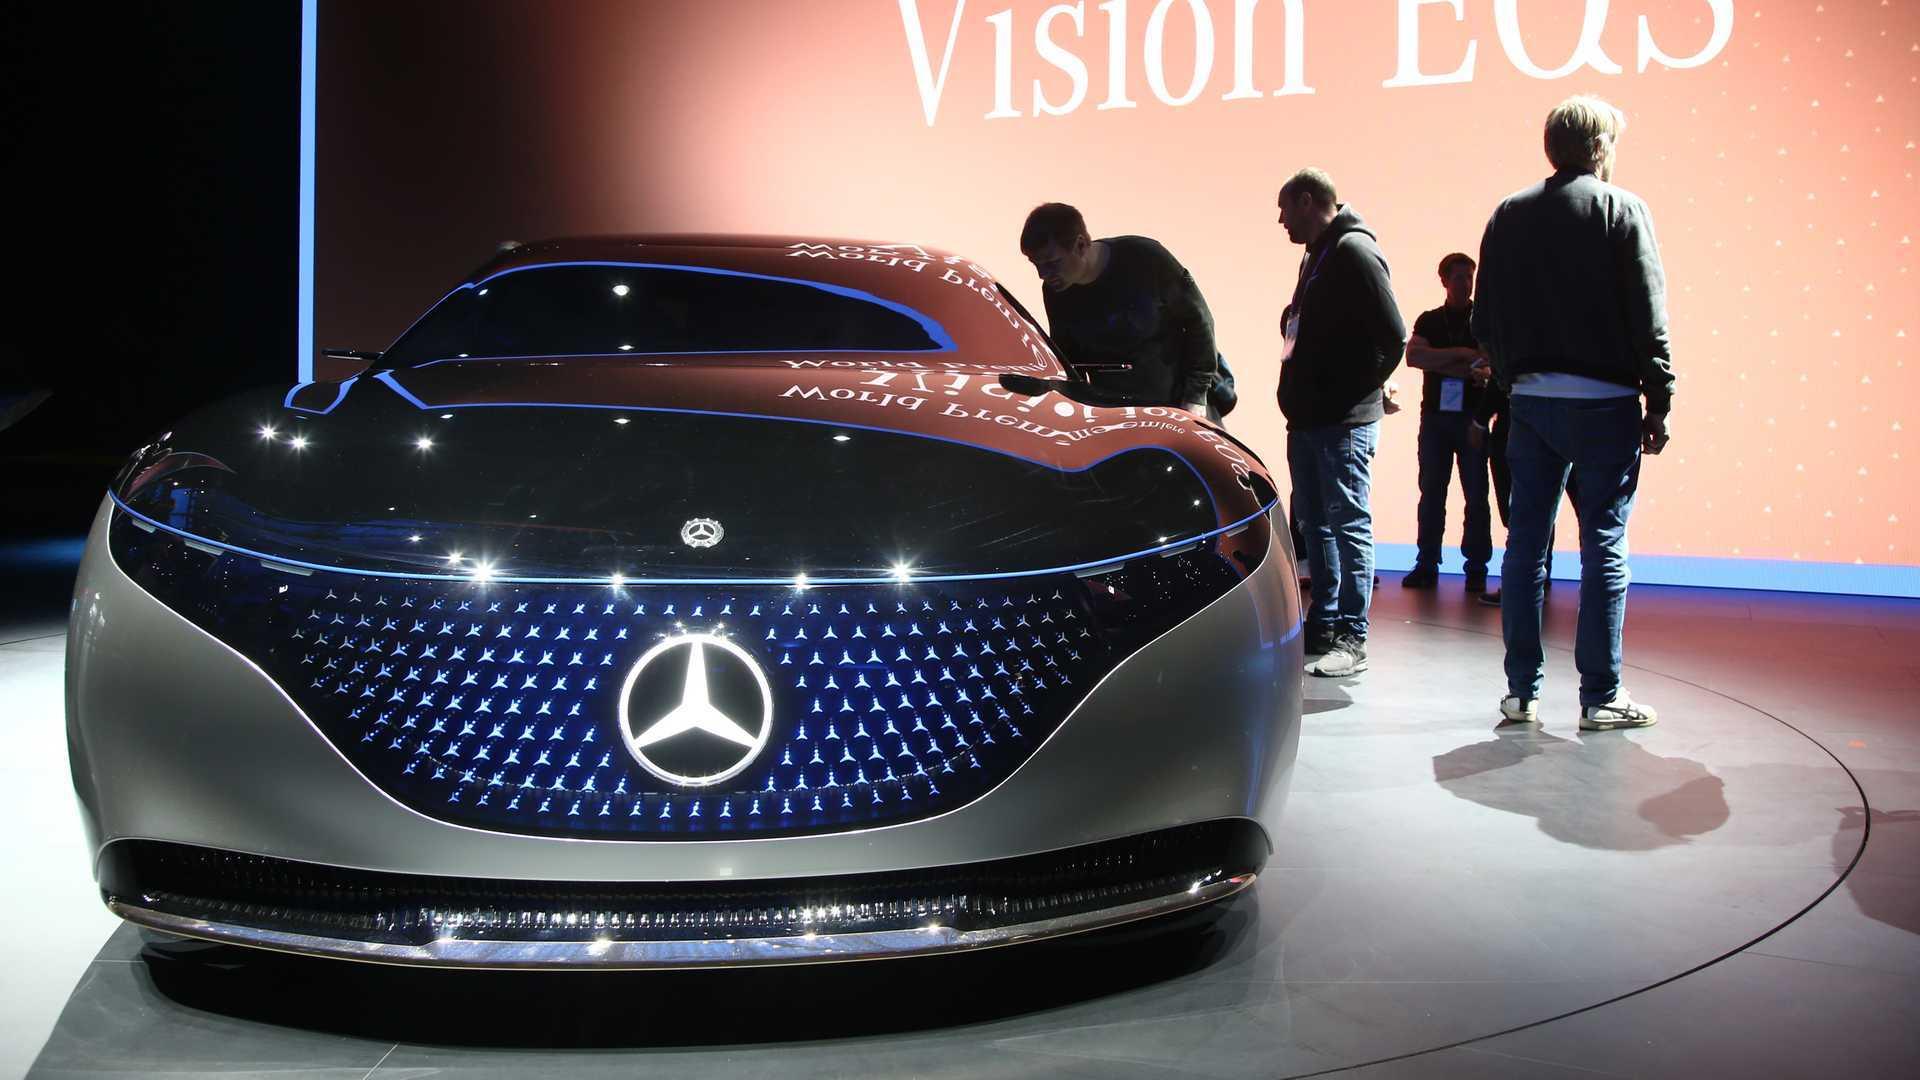 Mercedes Benz Vision Eqs Lights Up The Night In Frankfurt